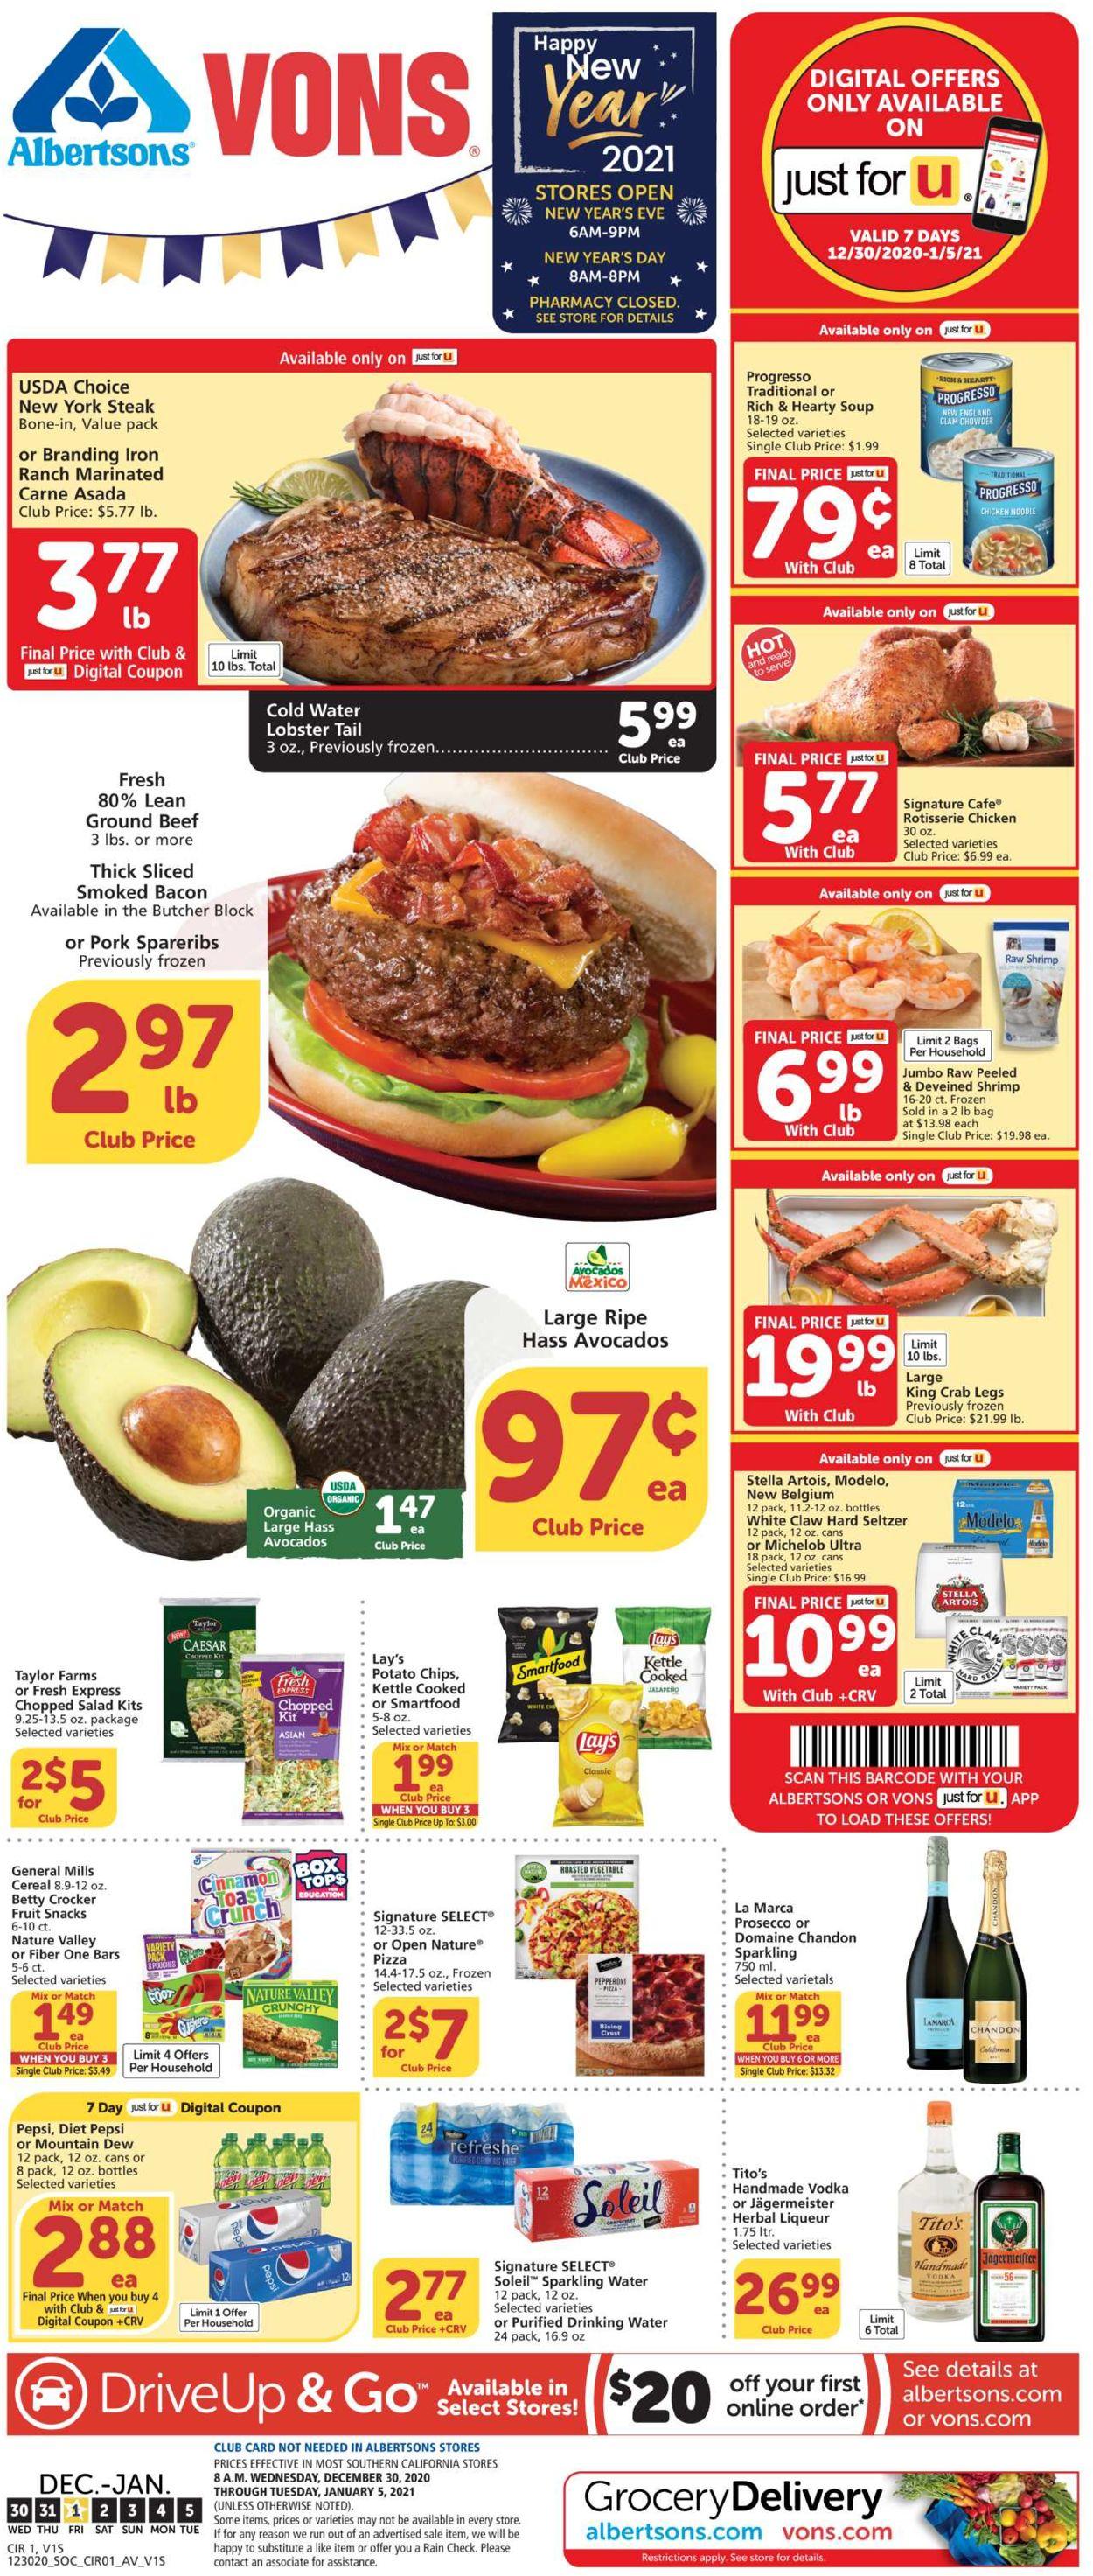 Vons Weekly Ad Circular - valid 12/30-01/05/2021